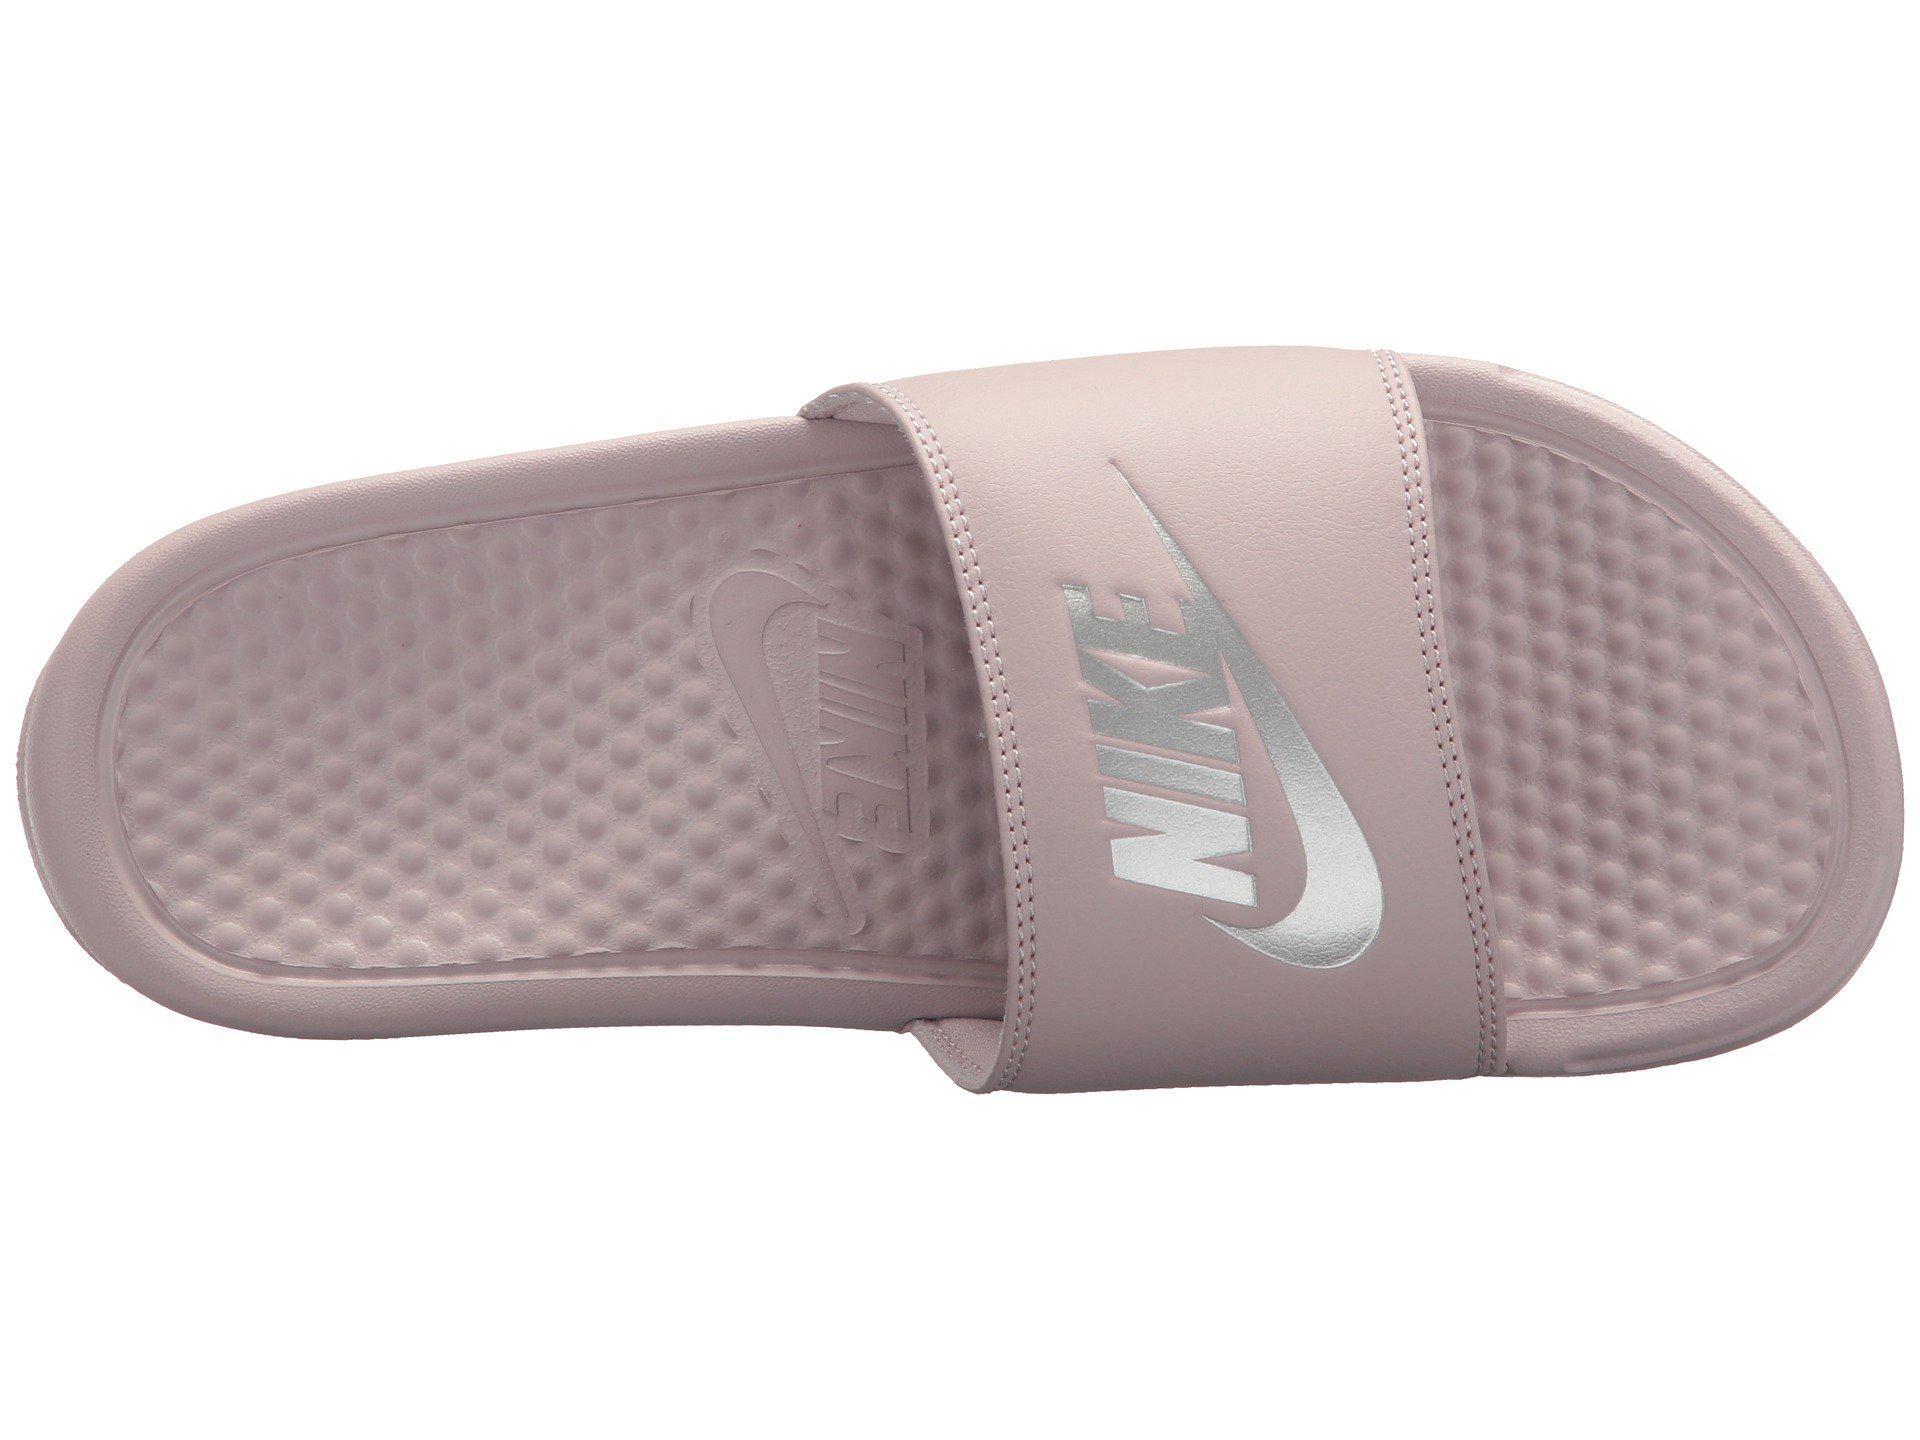 58bea148684f Lyst - Nike Benassi Jdi Slide (white-metallic Silver) Women s ...